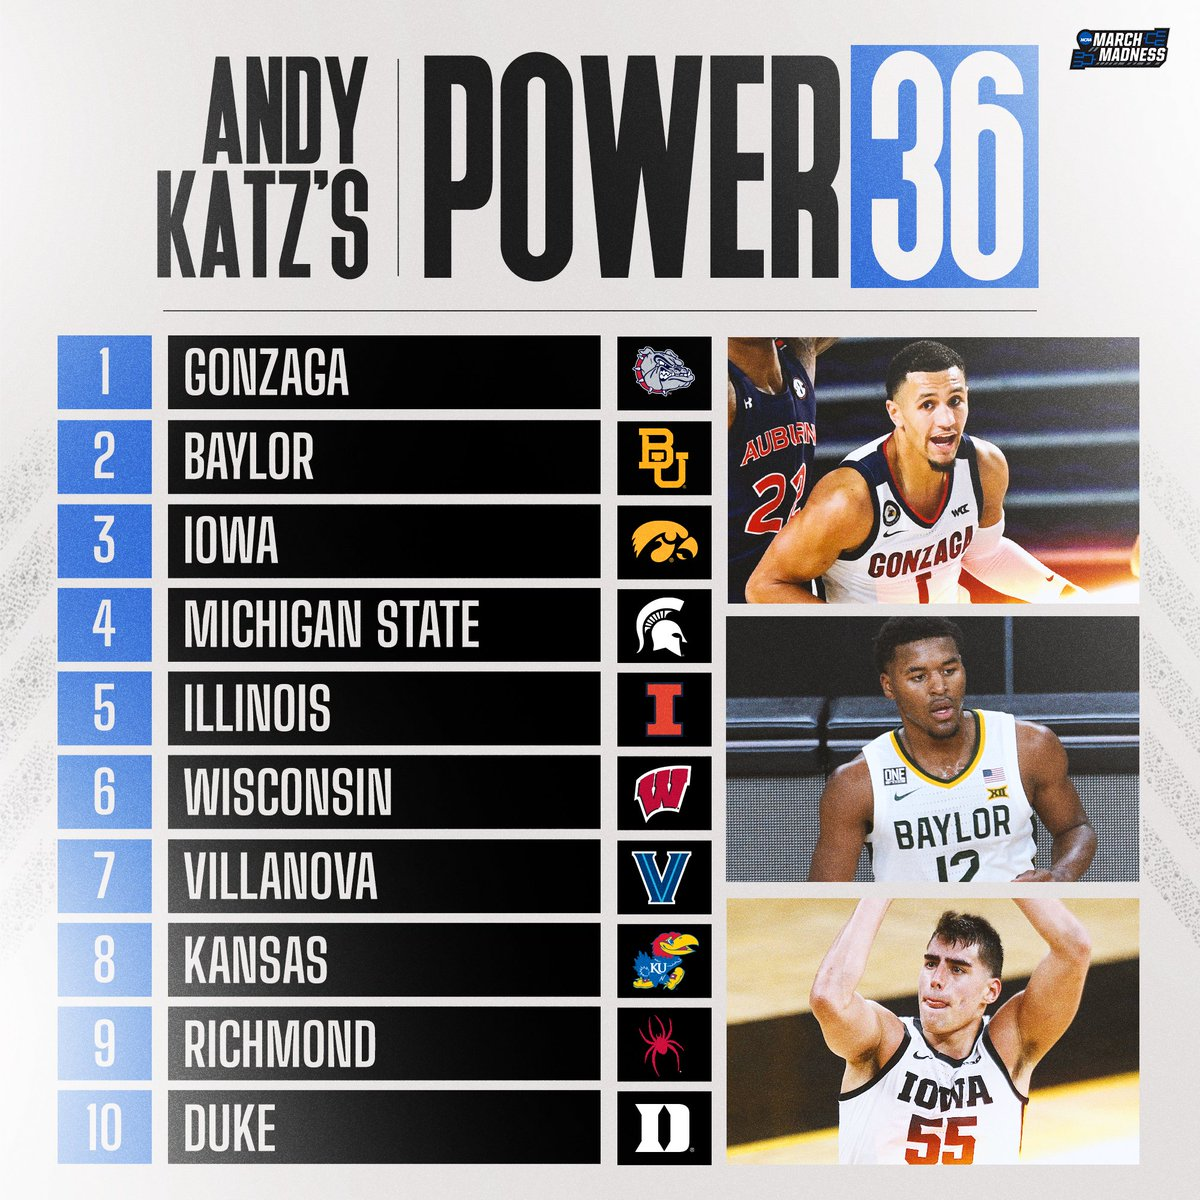 🚨 NEW #Power36 from @TheAndyKatz! 🚨  1. Gonzaga 2. Baylor 3. Iowa 4. Michigan State 5. Illinois 6. Wisconsin 7. Villanova 8. Kansas 9. Richmond 10. Duke 11-36. 👉 https://t.co/cSk7yZmdVT https://t.co/jouWS1lj5d